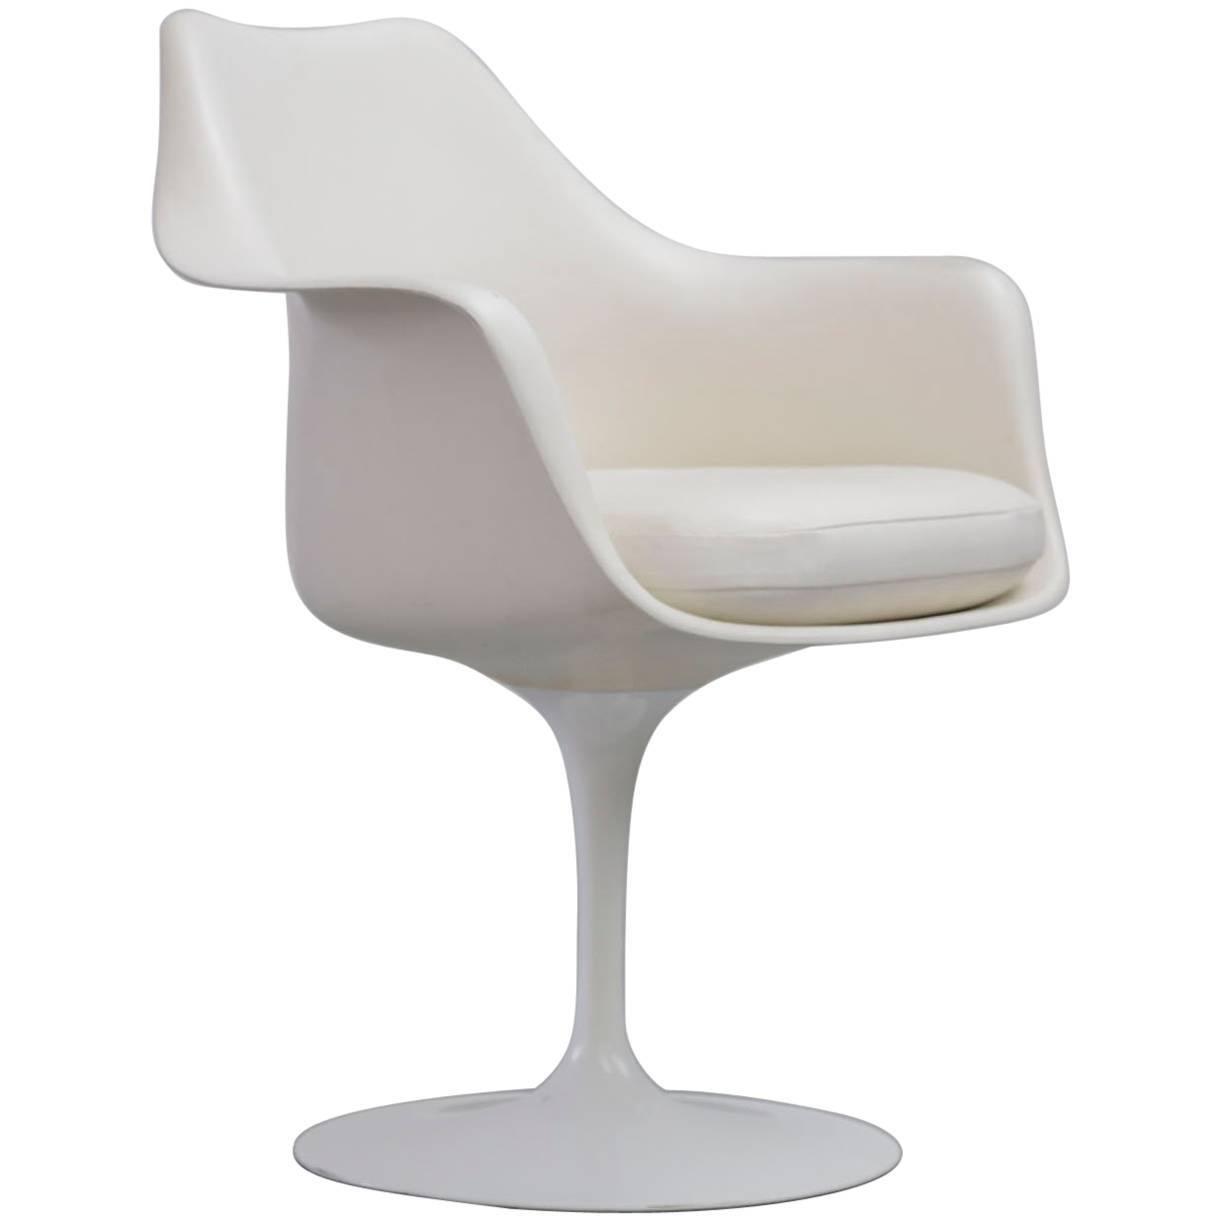 Tulip Armchair By Eero Saarinen, Knoll International For Sale